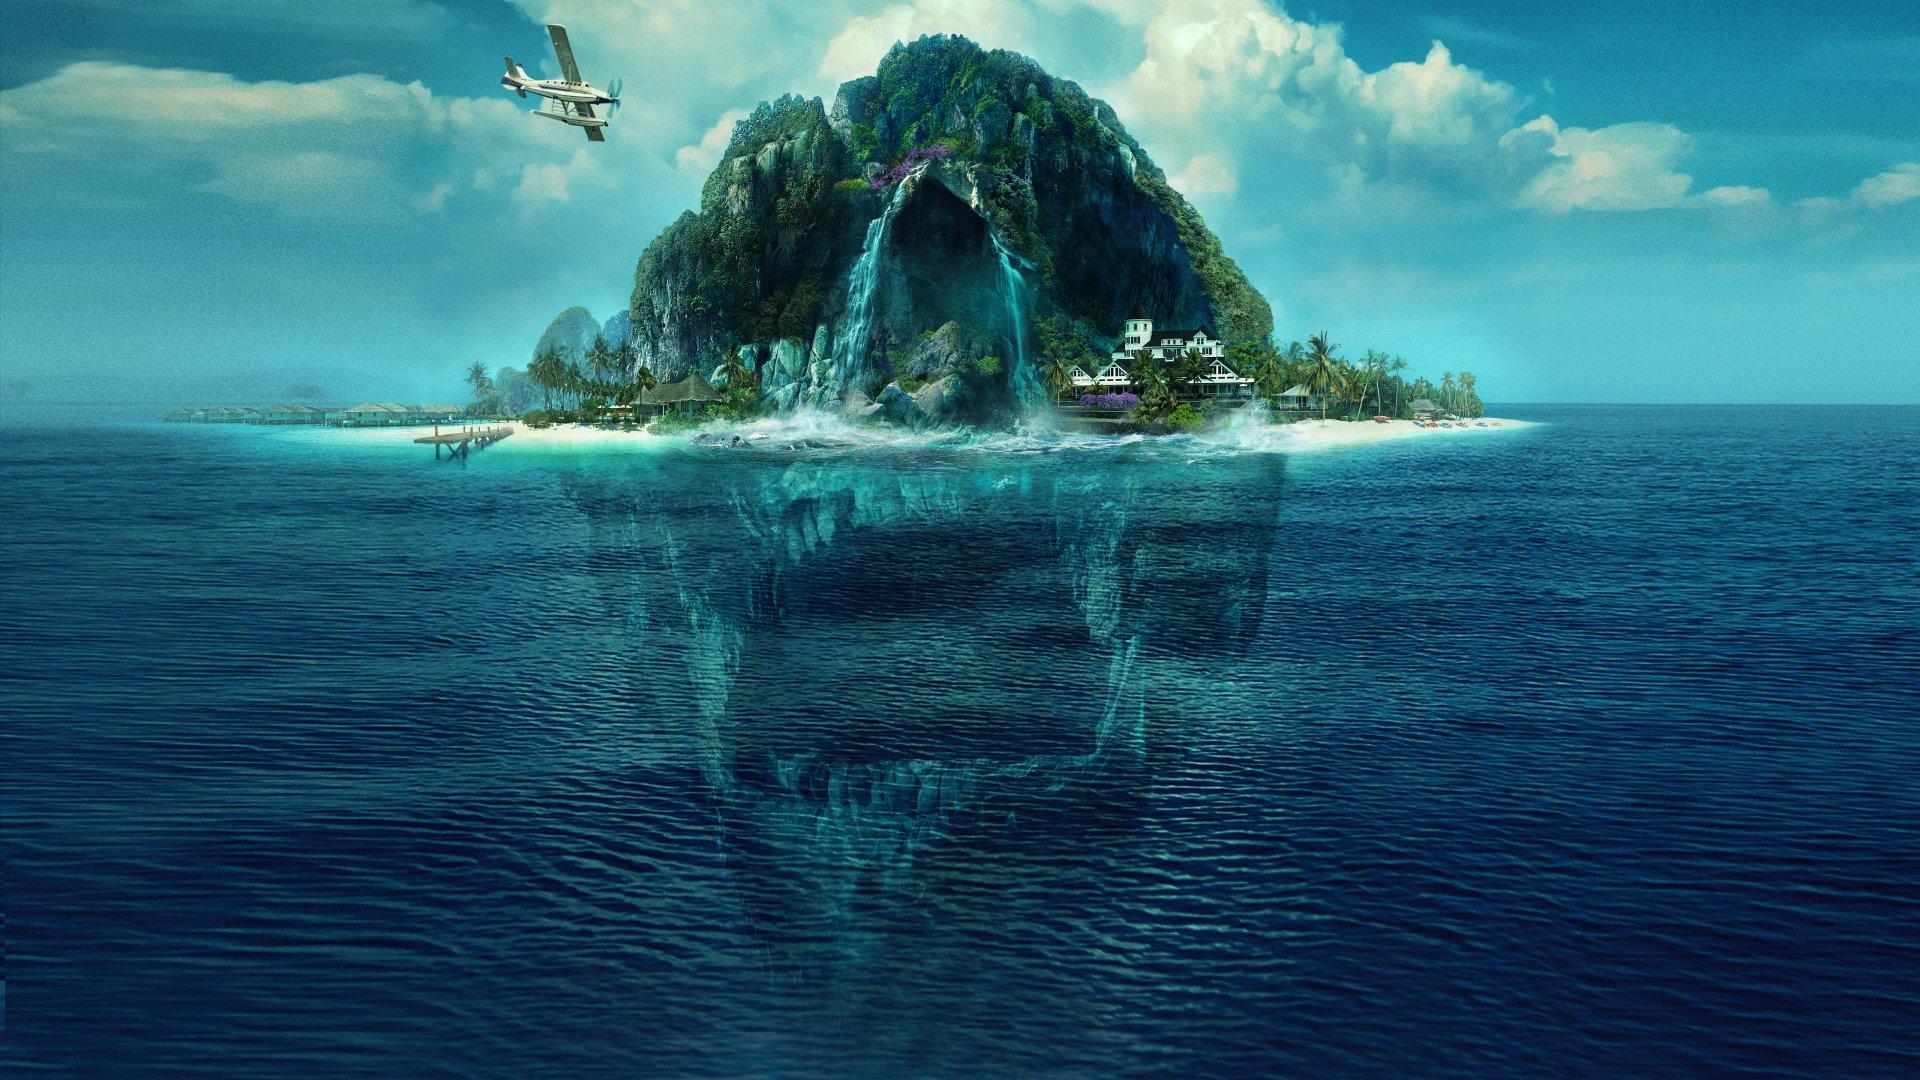 fantasy island movie 2020 hd wallpaper 2080